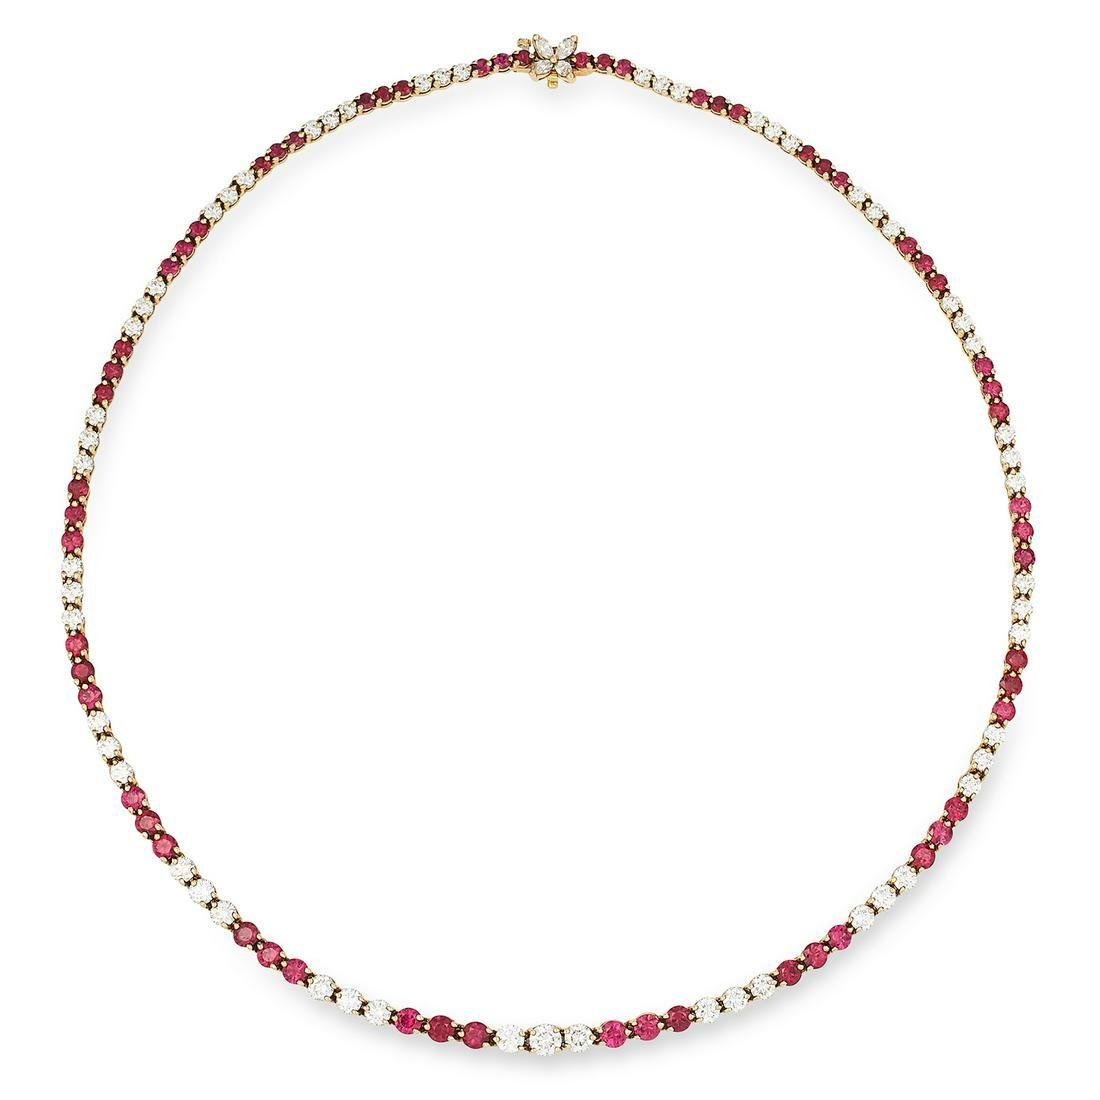 RUBY AND DIAMOND RIVIERA NECKLACE, TIFFANY & CO set